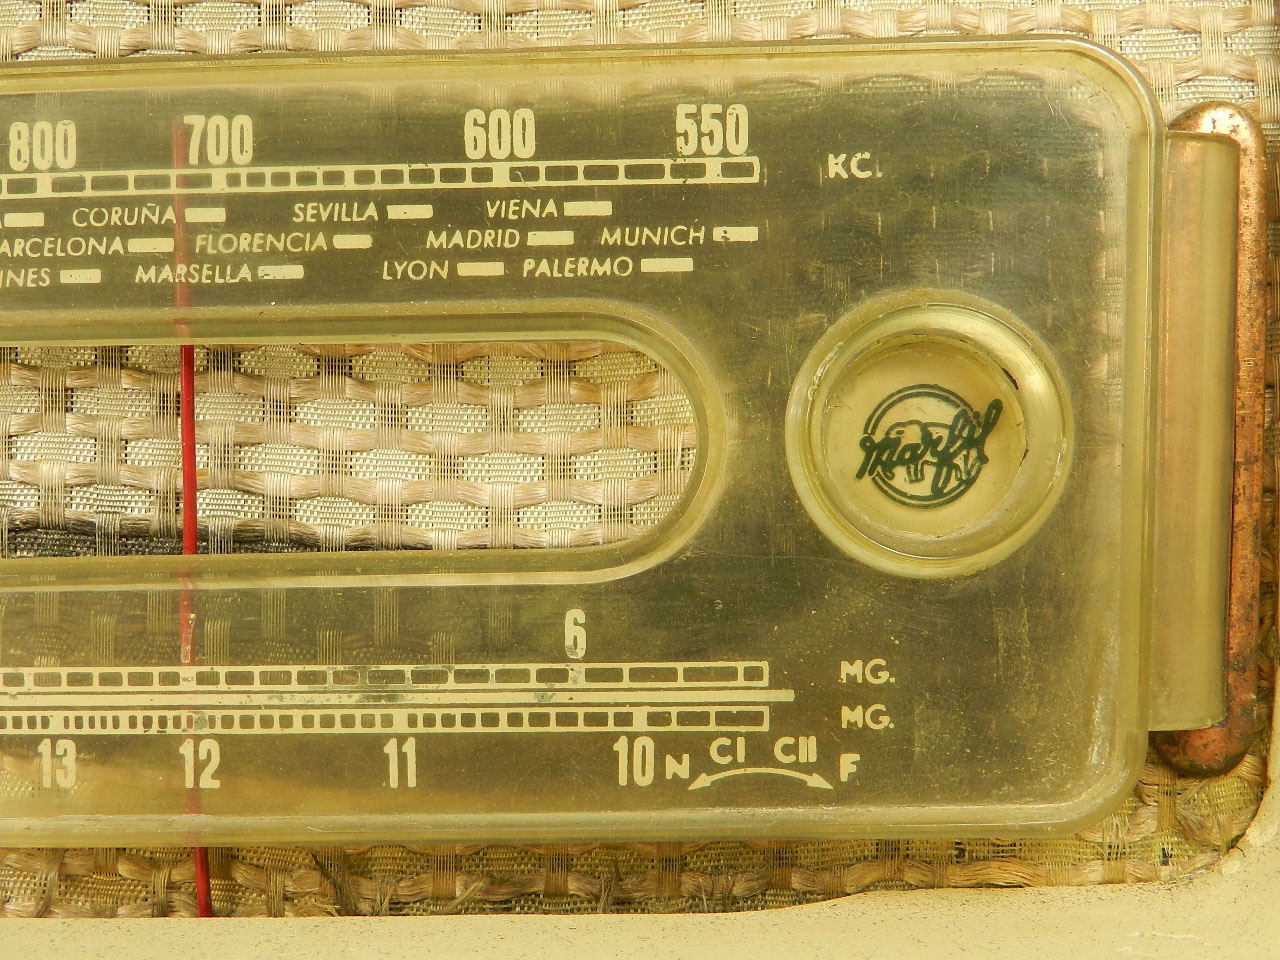 Imagen RADIO MARFIL AN-355 O.M  AÑO 1950 25922